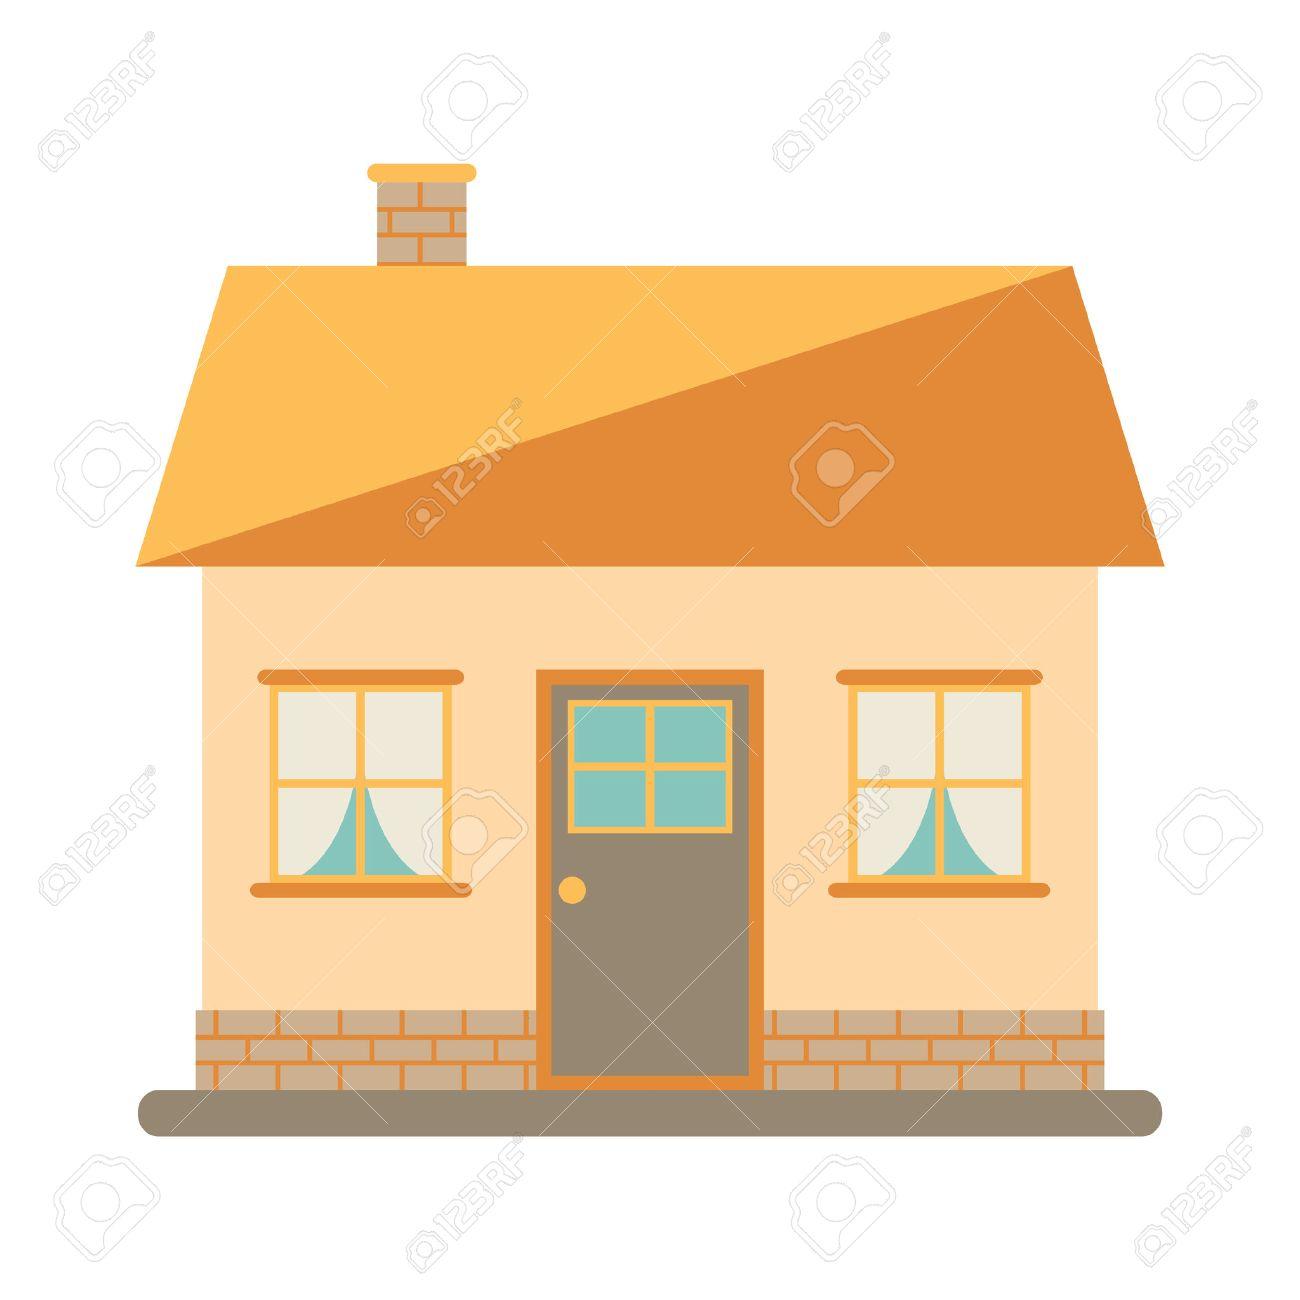 Comprar Casa Moderna. Interesting Vendo Casa Moderna With Comprar ...